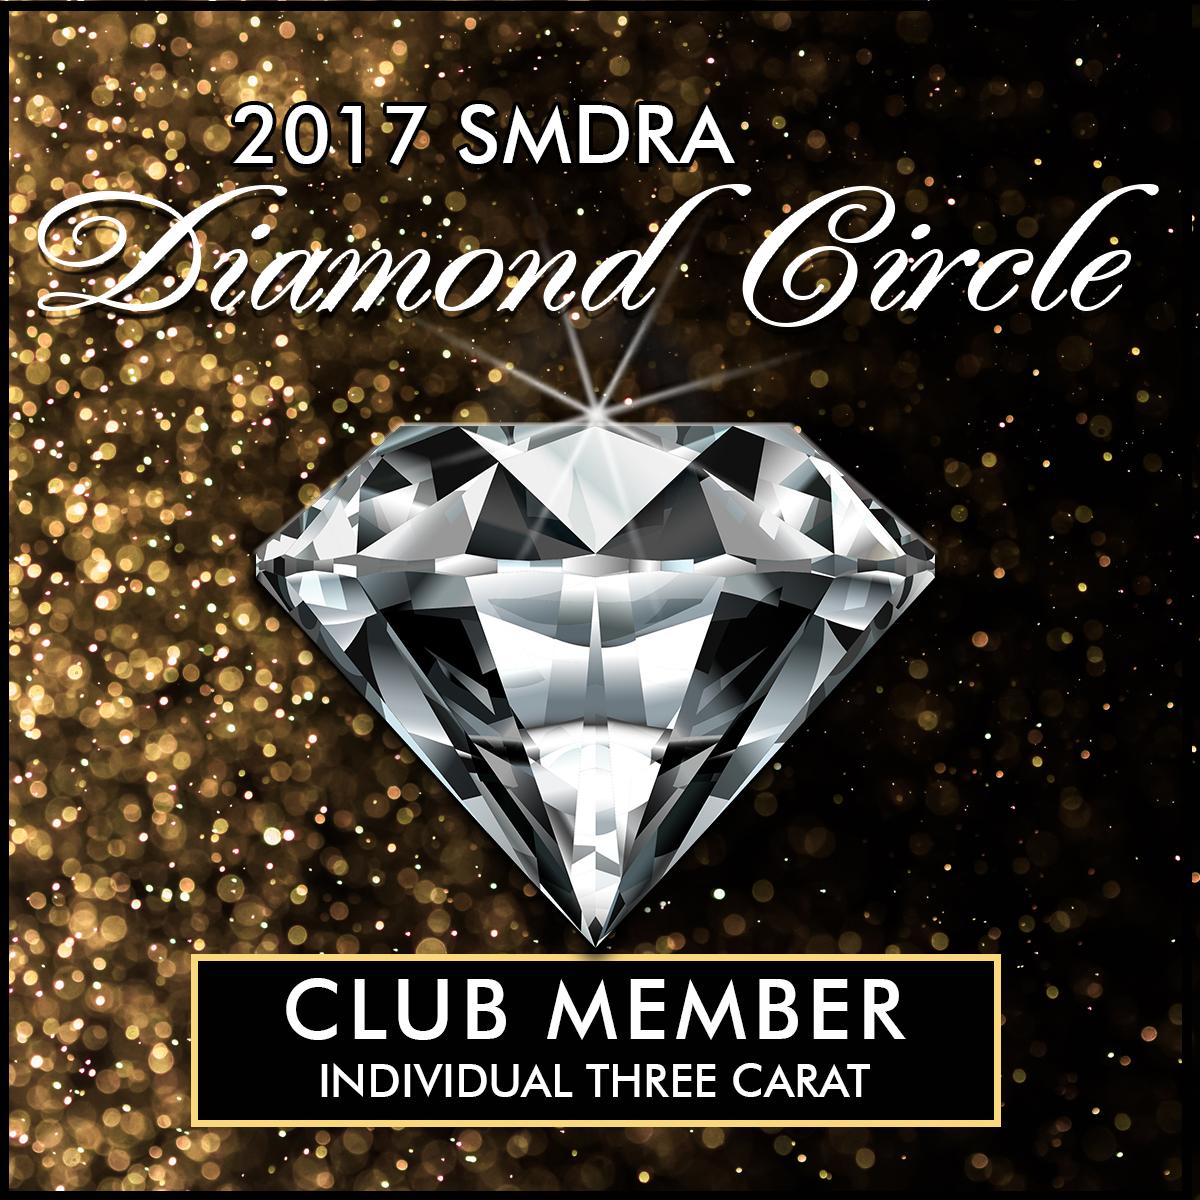 2017 Individual Three Carat